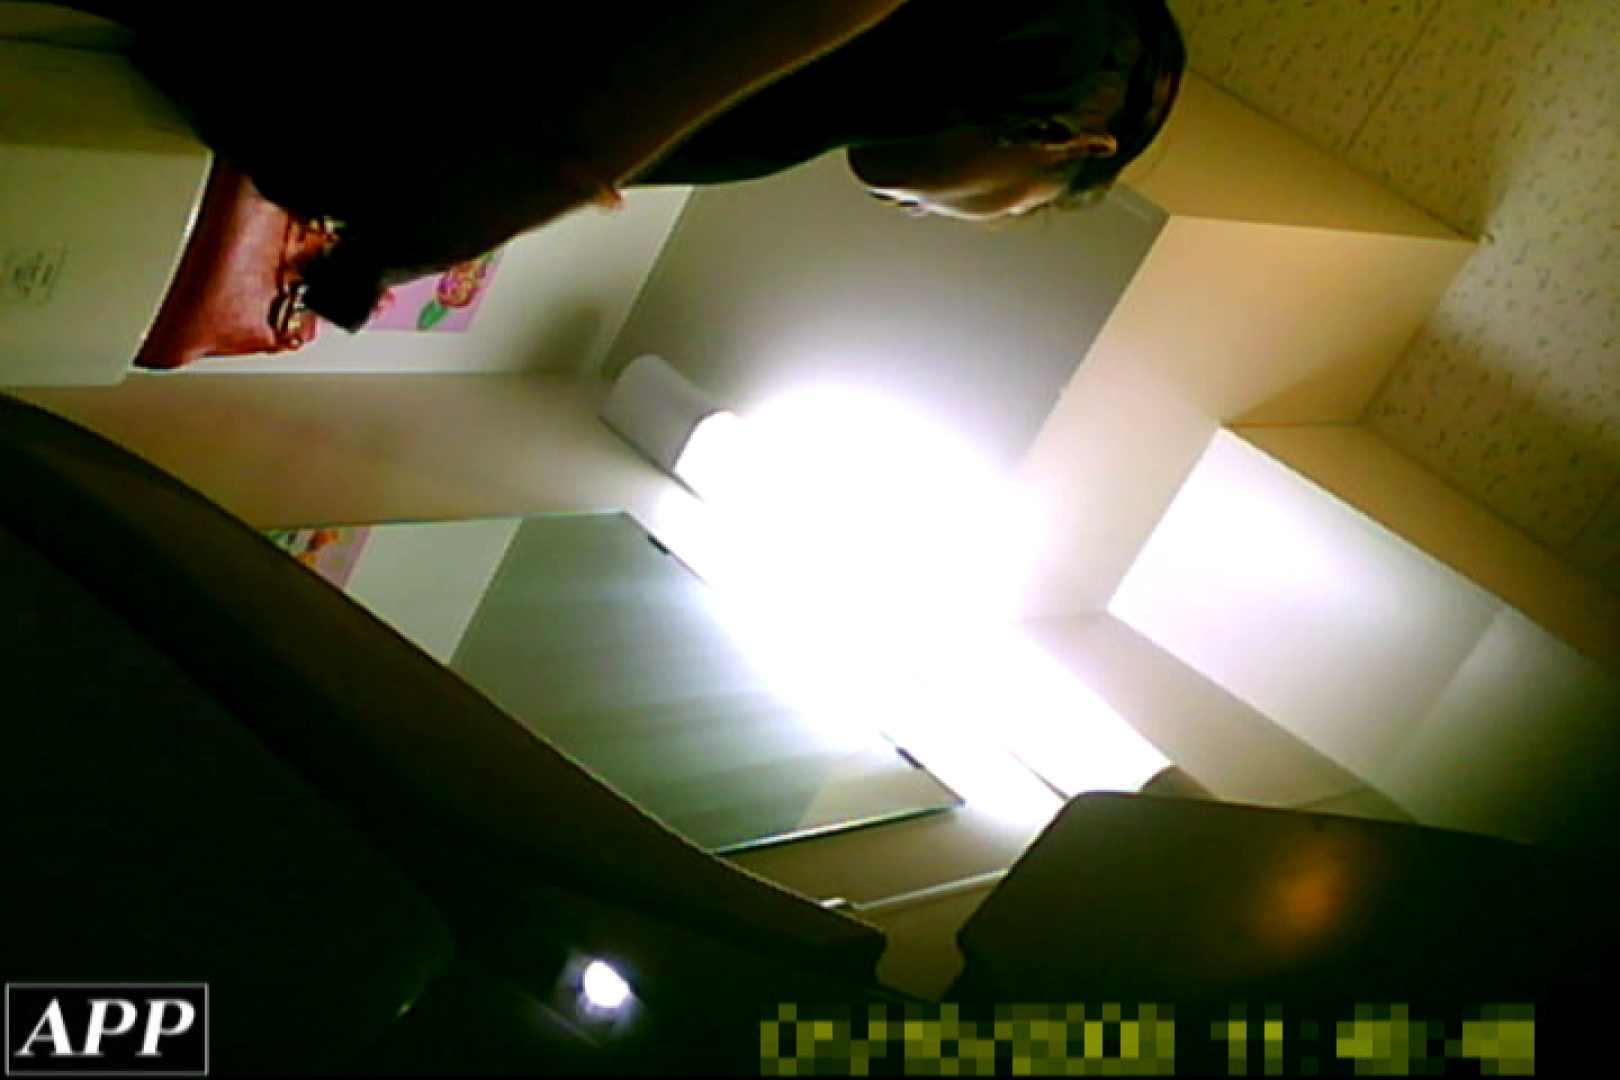 3視点洗面所 vol.127 OLハメ撮り  22Pix 20